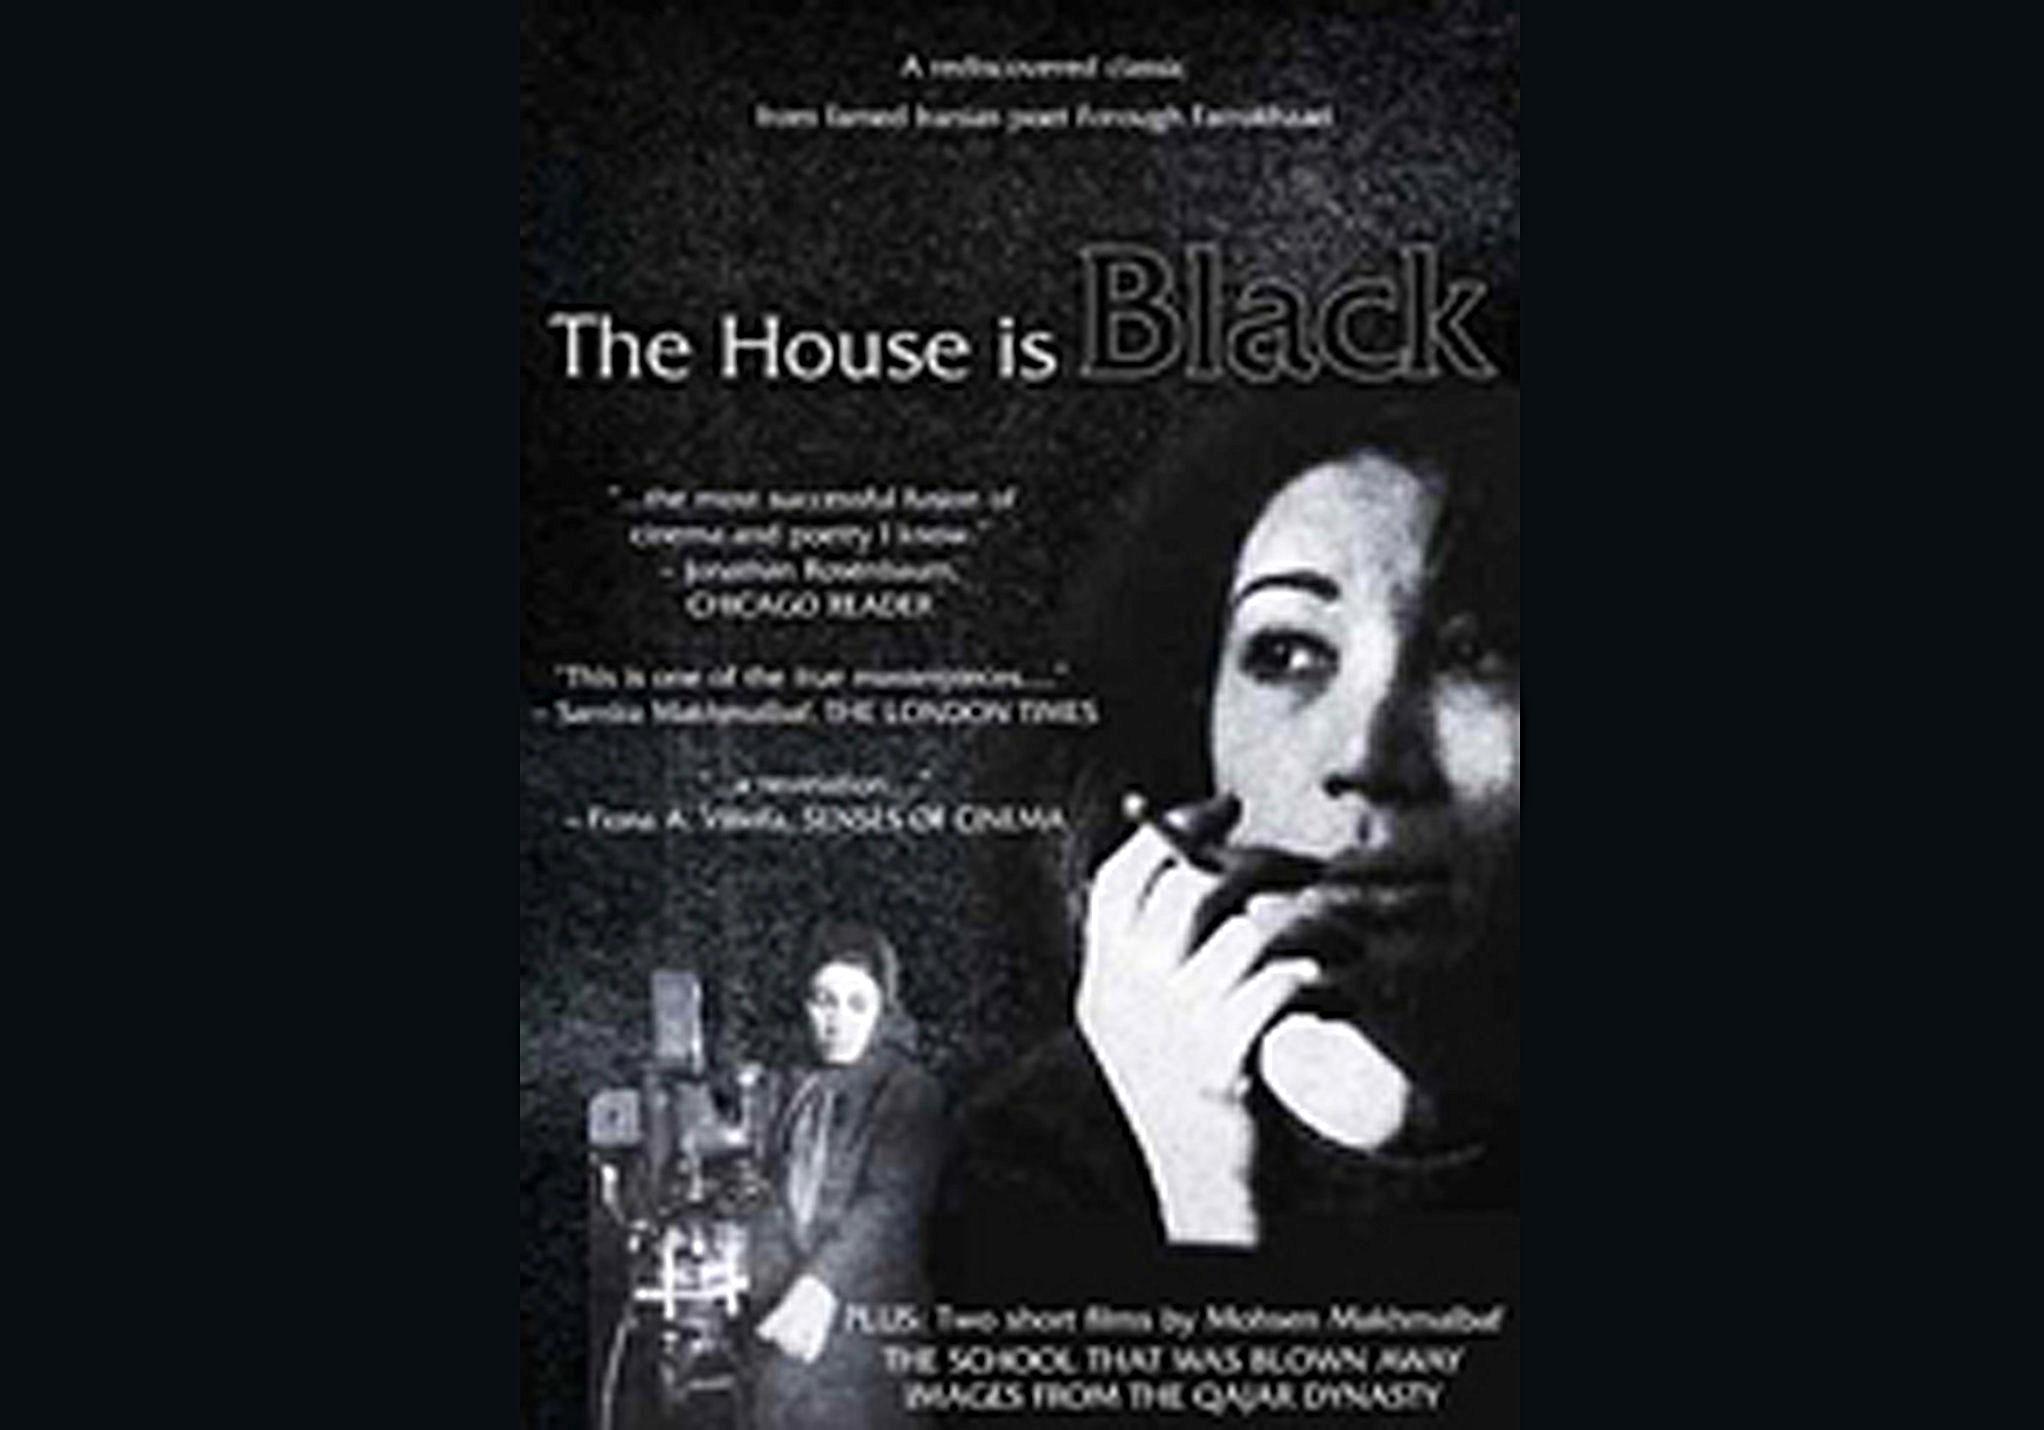 Figure 4 : Poster for Farrokhzad's film, The House Is Black.